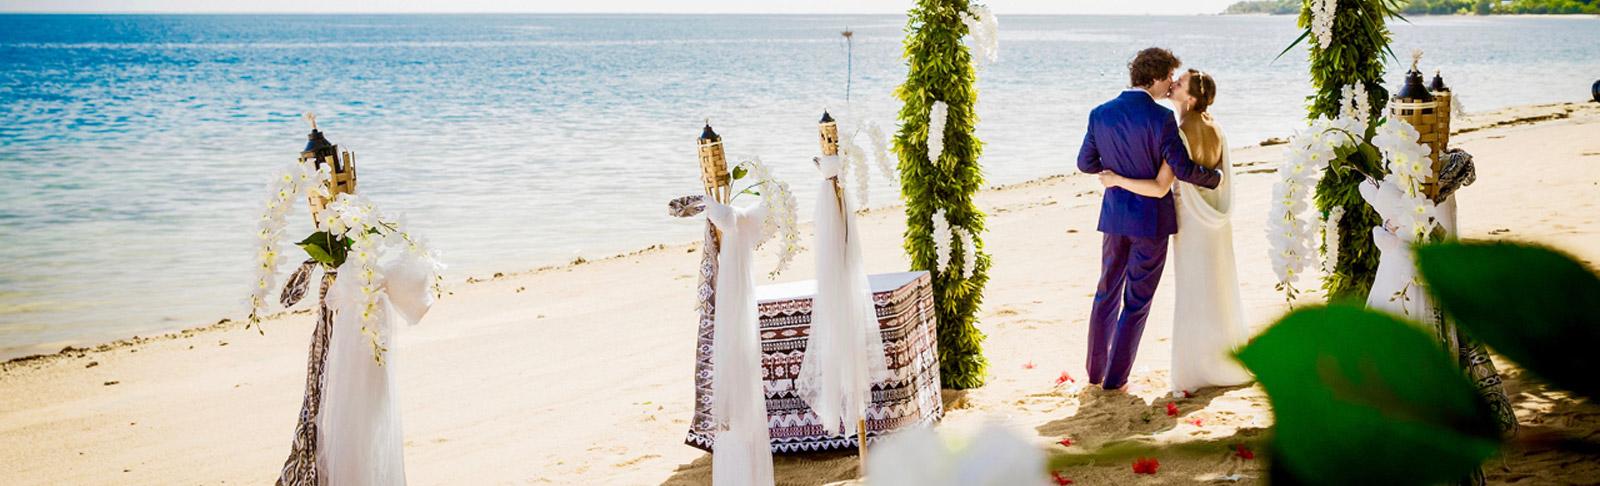 fiji wedding malolo island resort